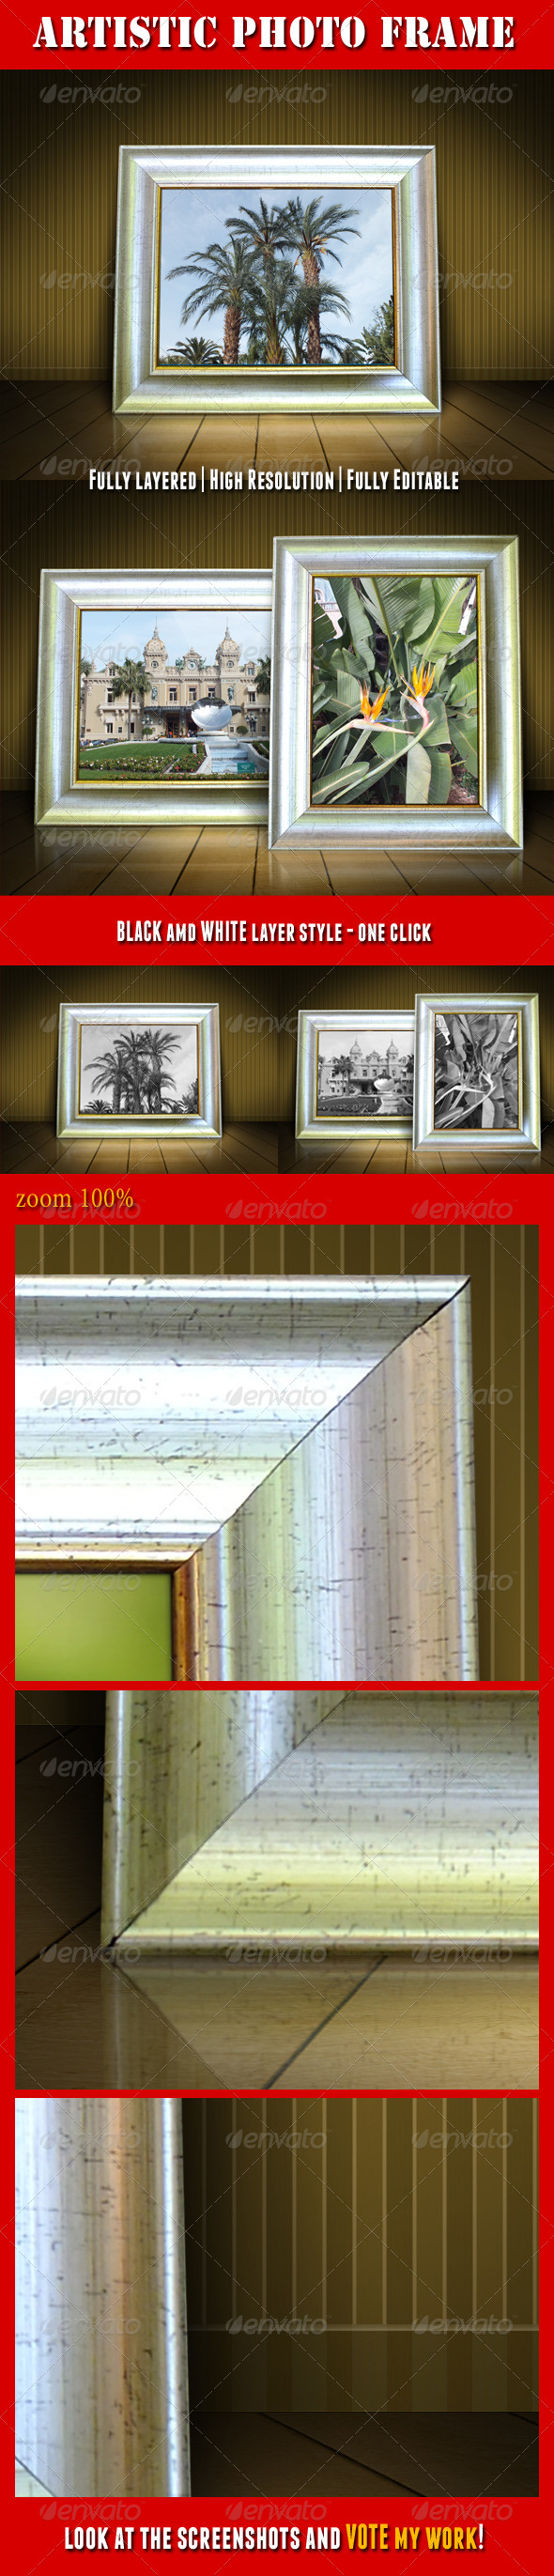 Artistic Photo Frame - Artistic Photo Templates